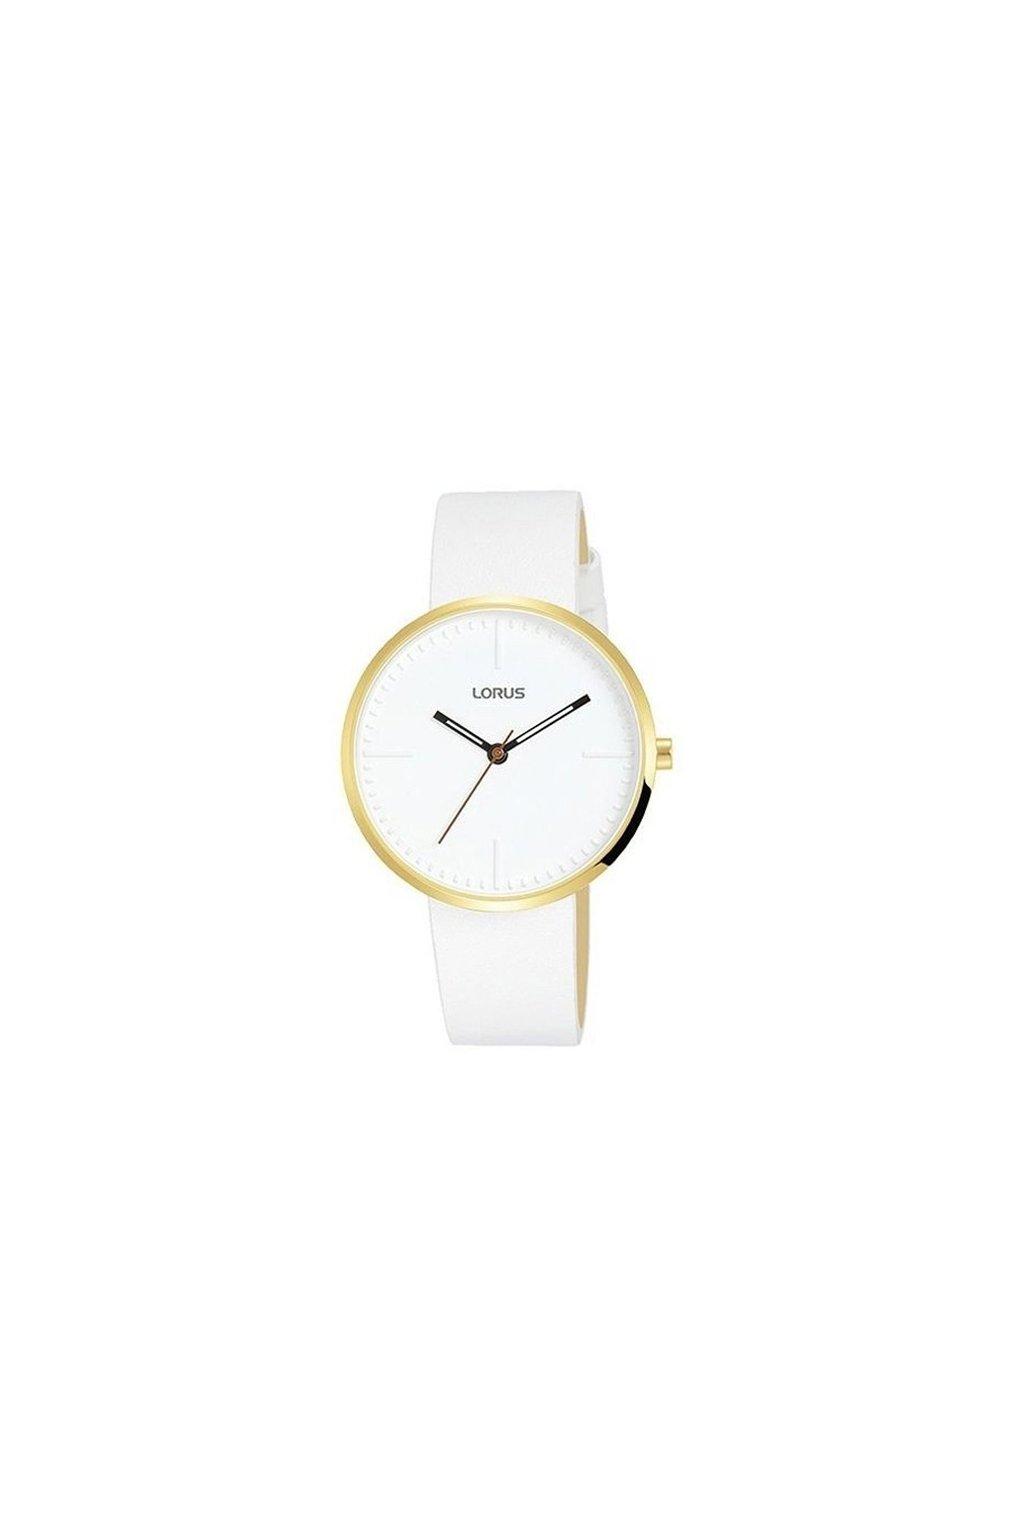 damske hodinky lorus rg274nx9 34 mm 123753